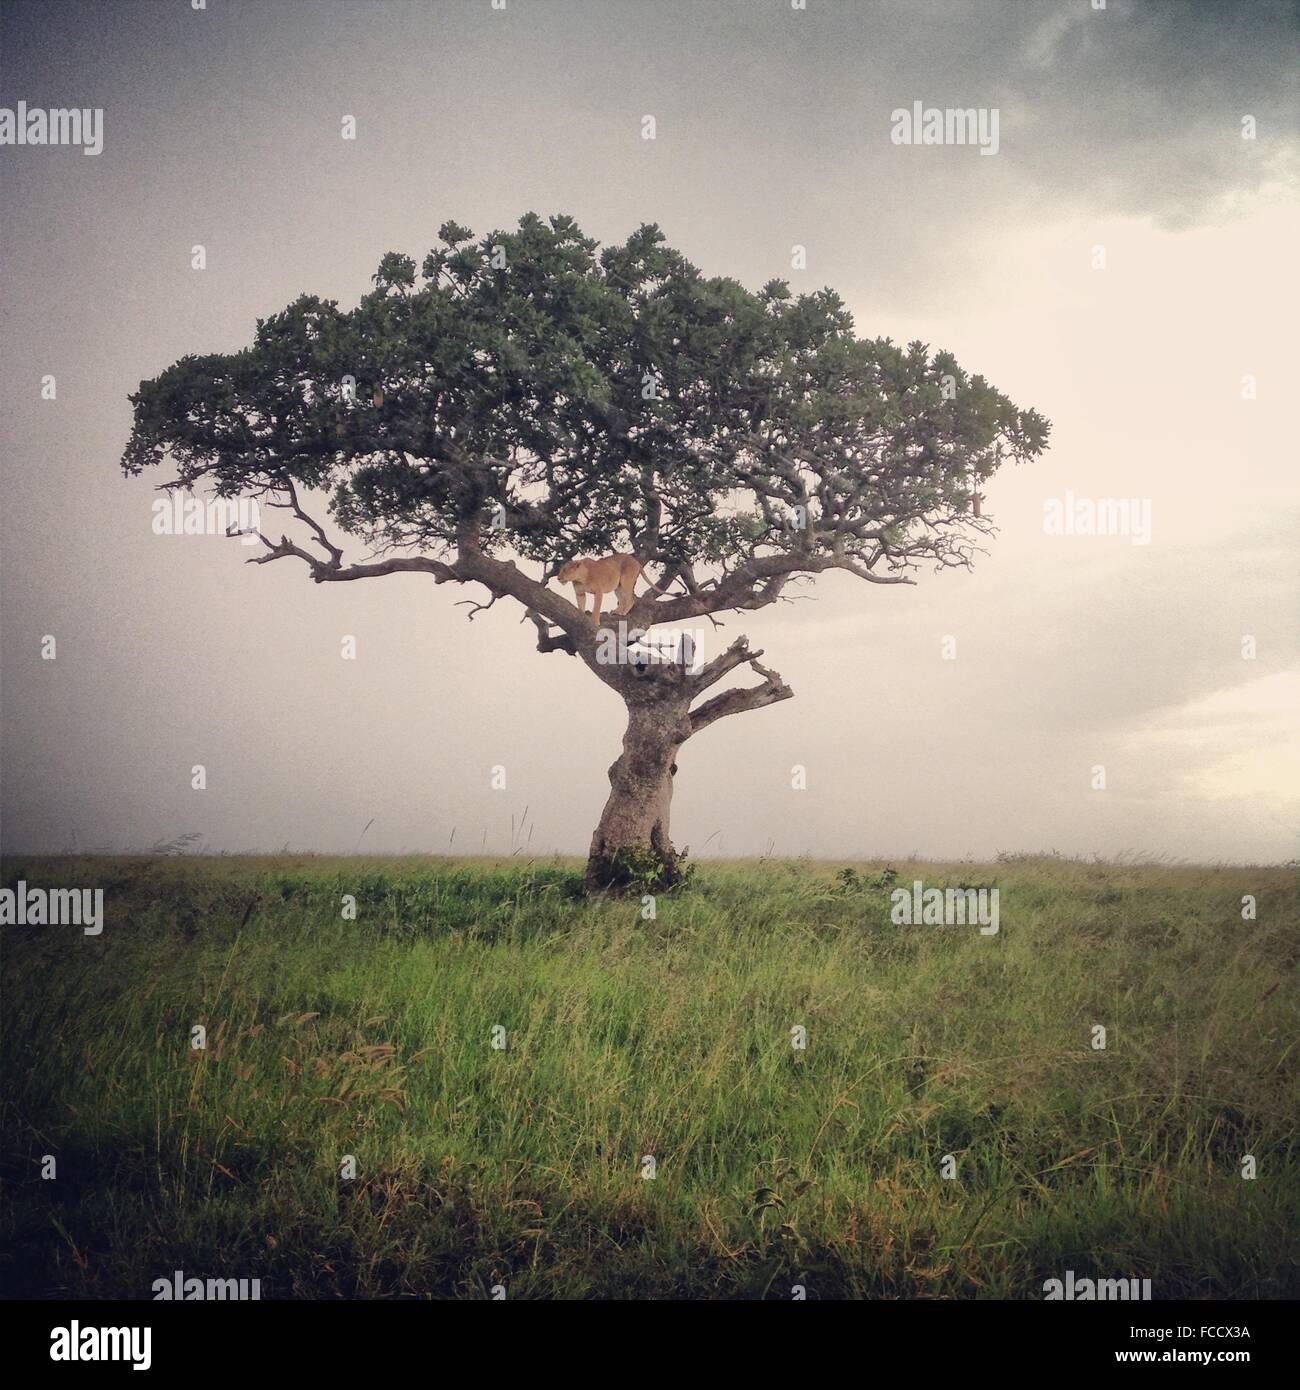 León de pie sobre un árbol Imagen De Stock